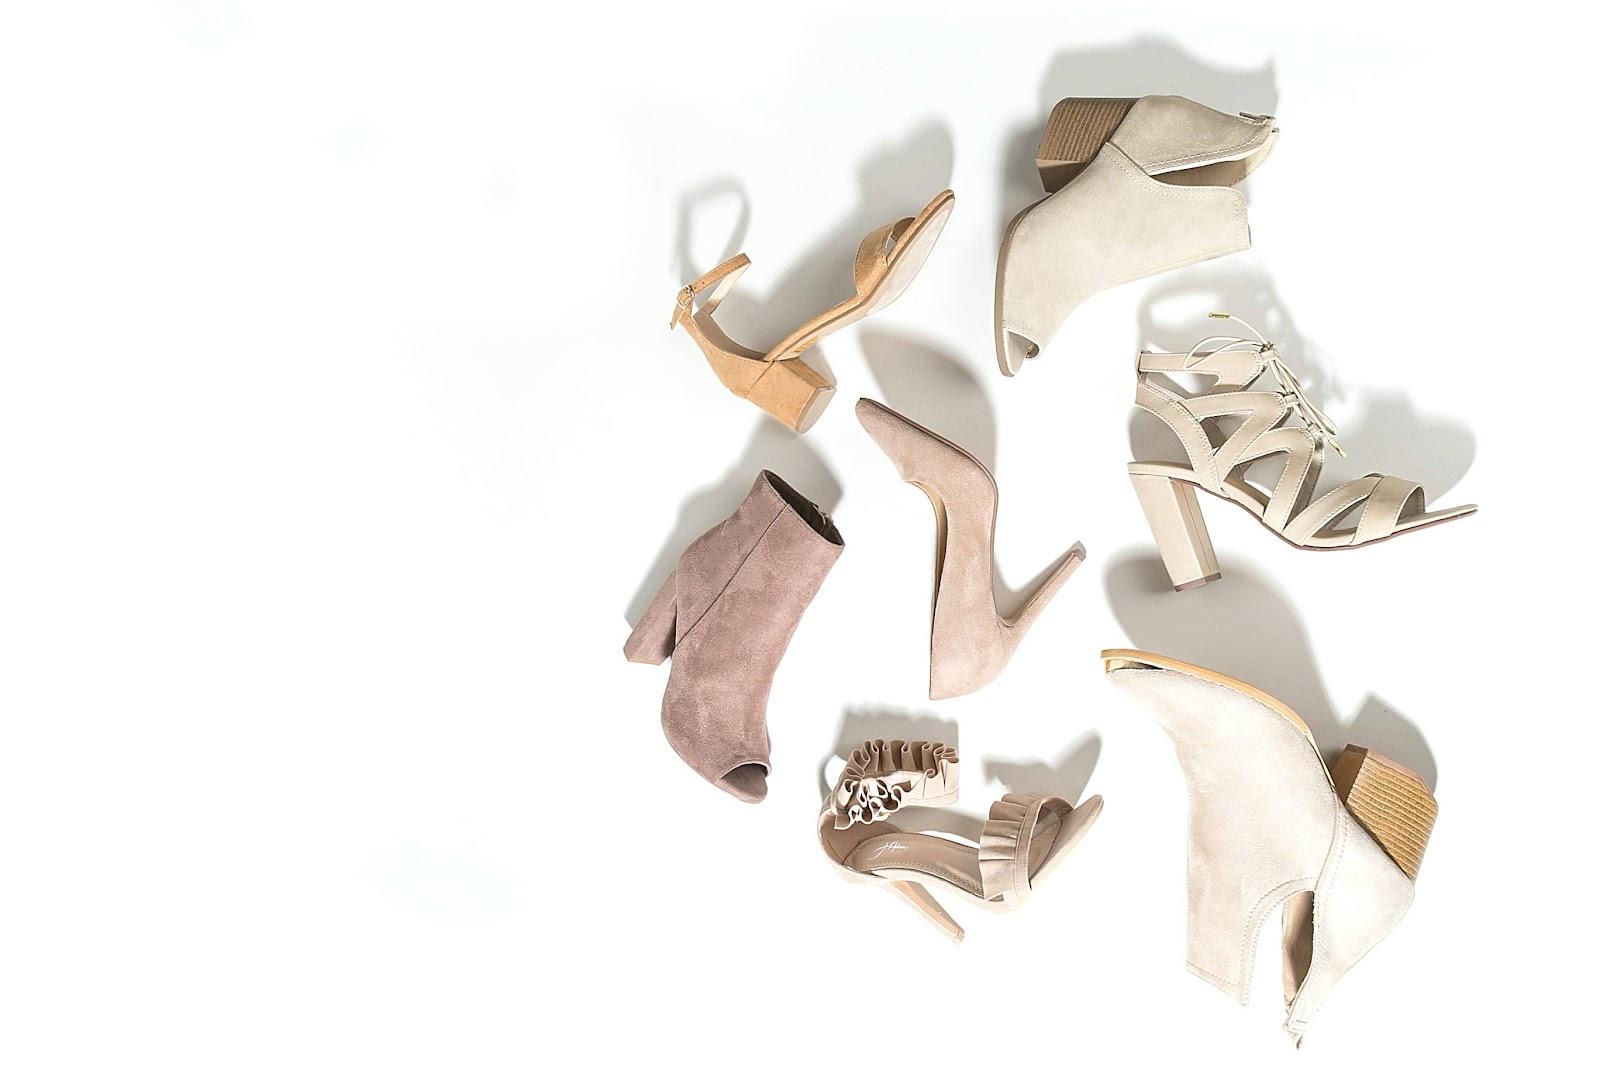 scarpe-da-donna-su-sfondo-bianco